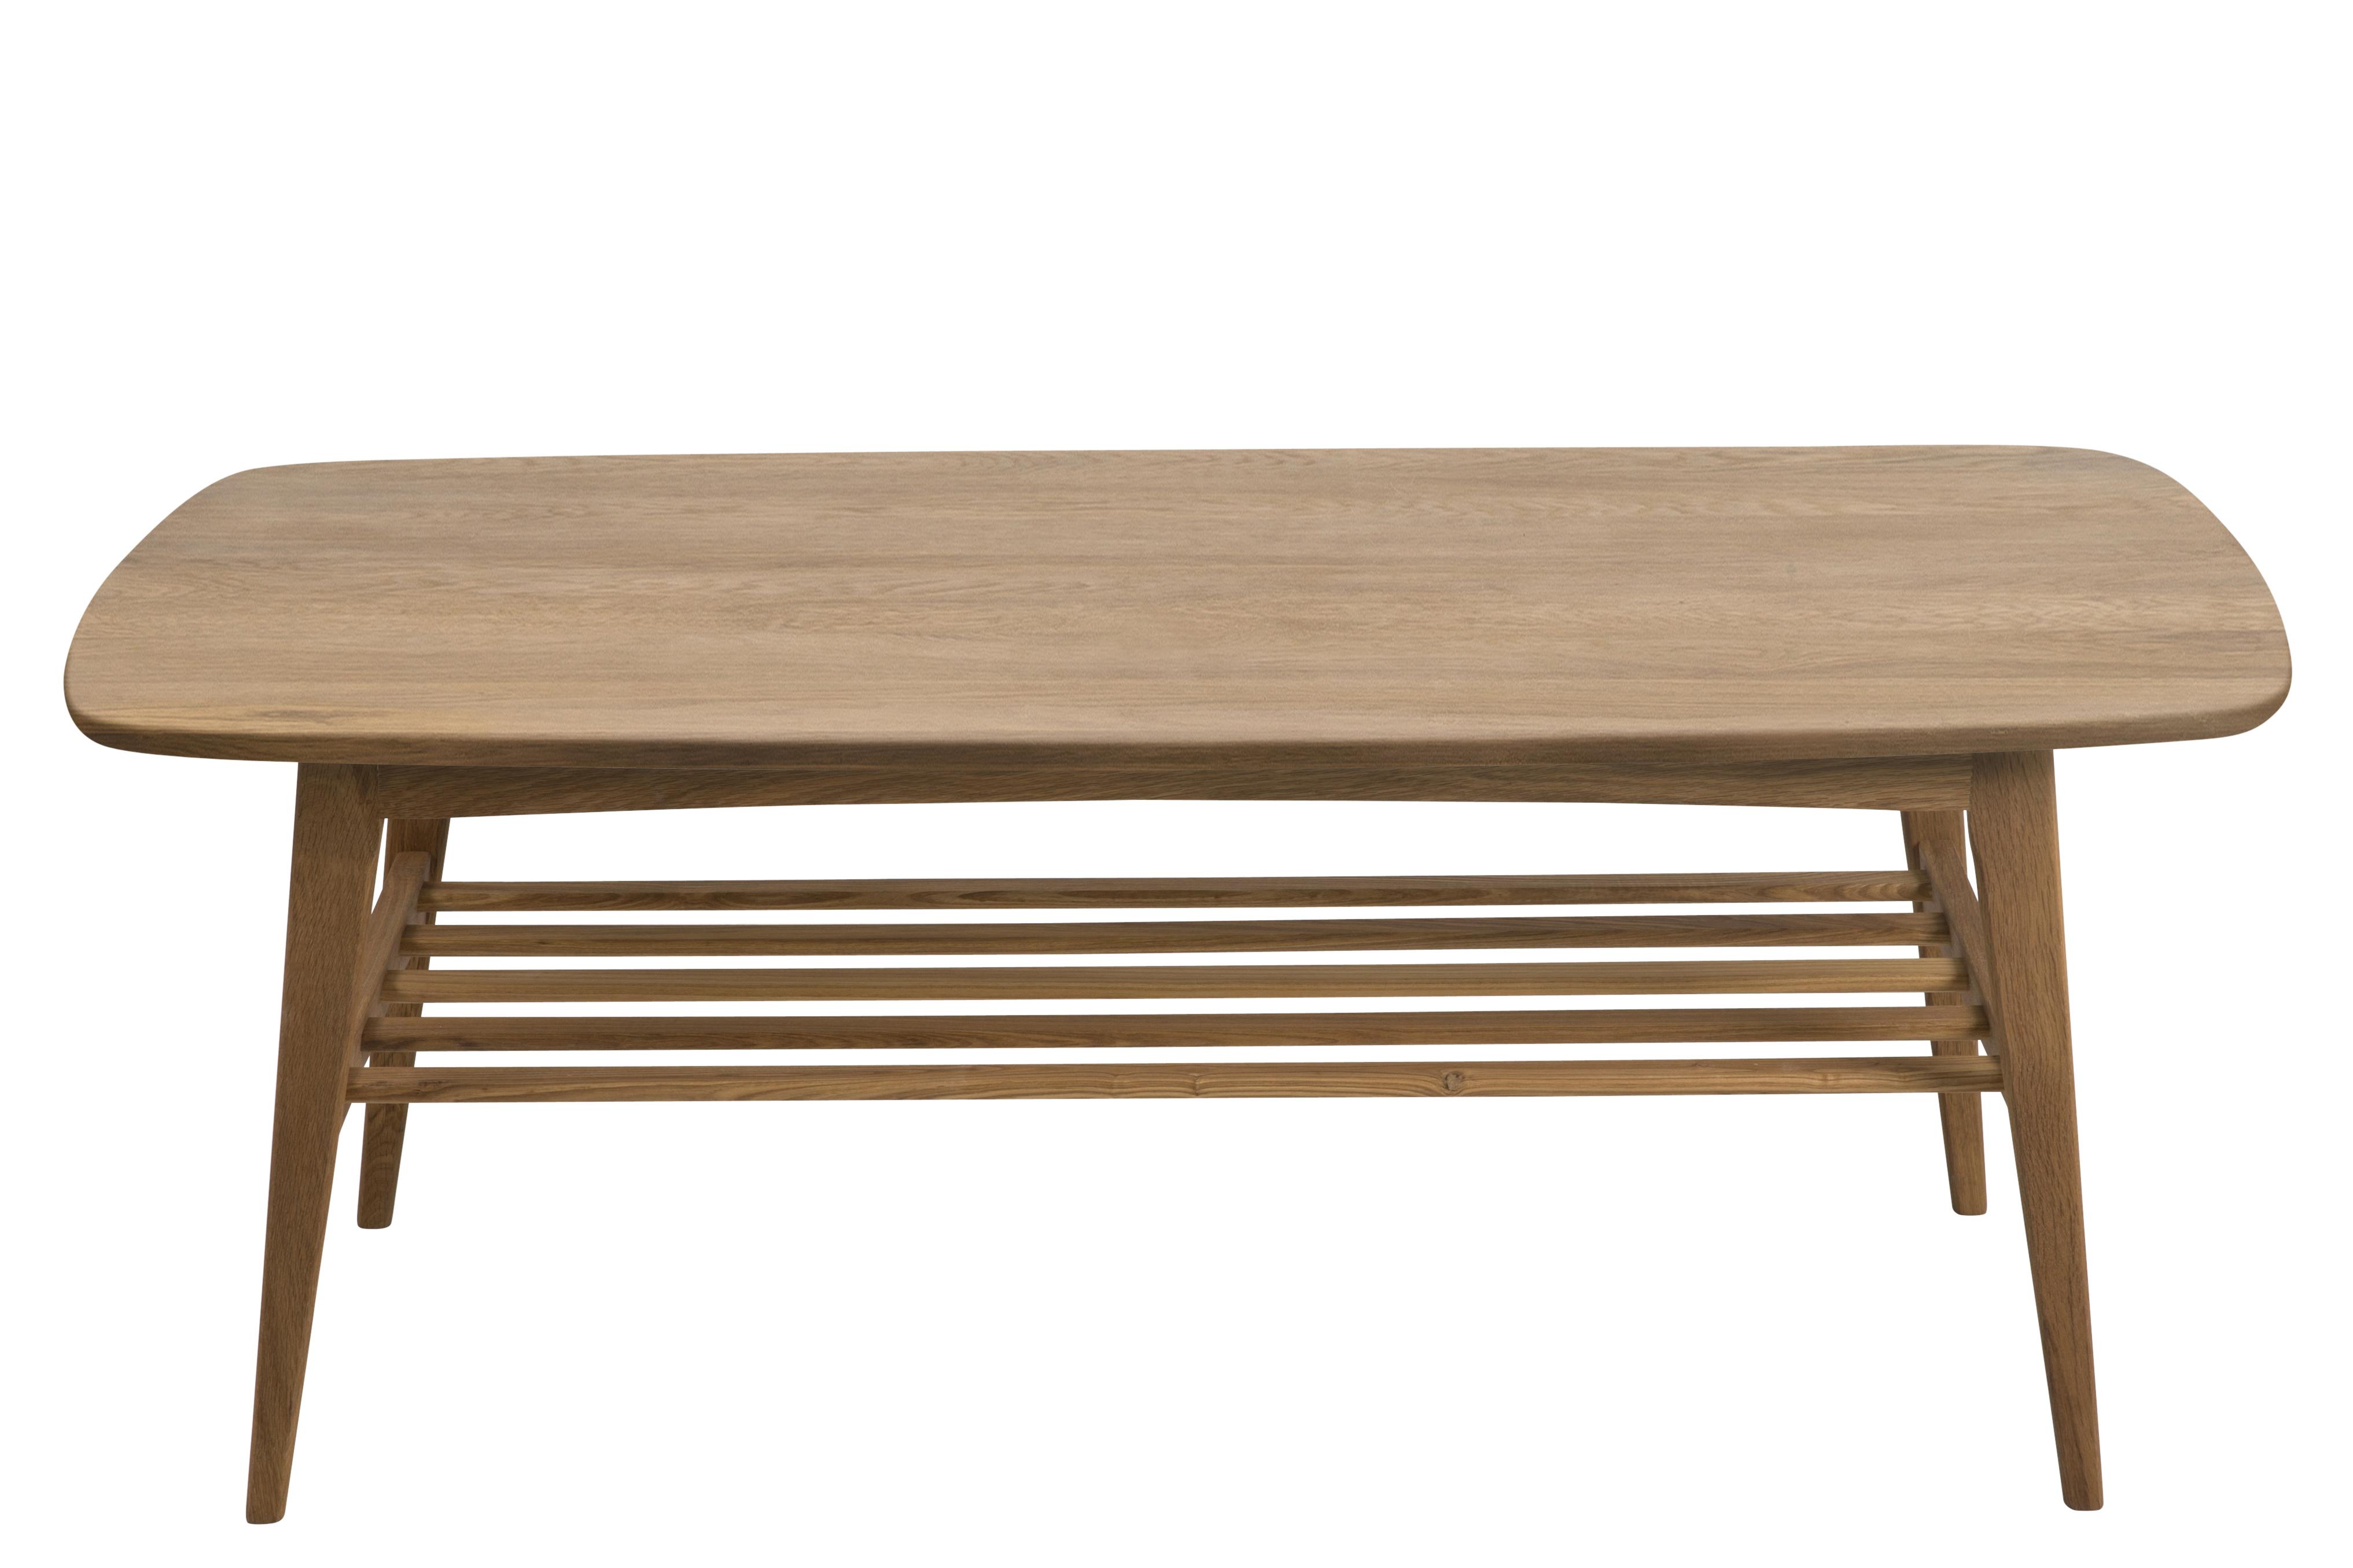 Masa de cafea din lemn si furnir Woodstock, L120xl60xh47 cm